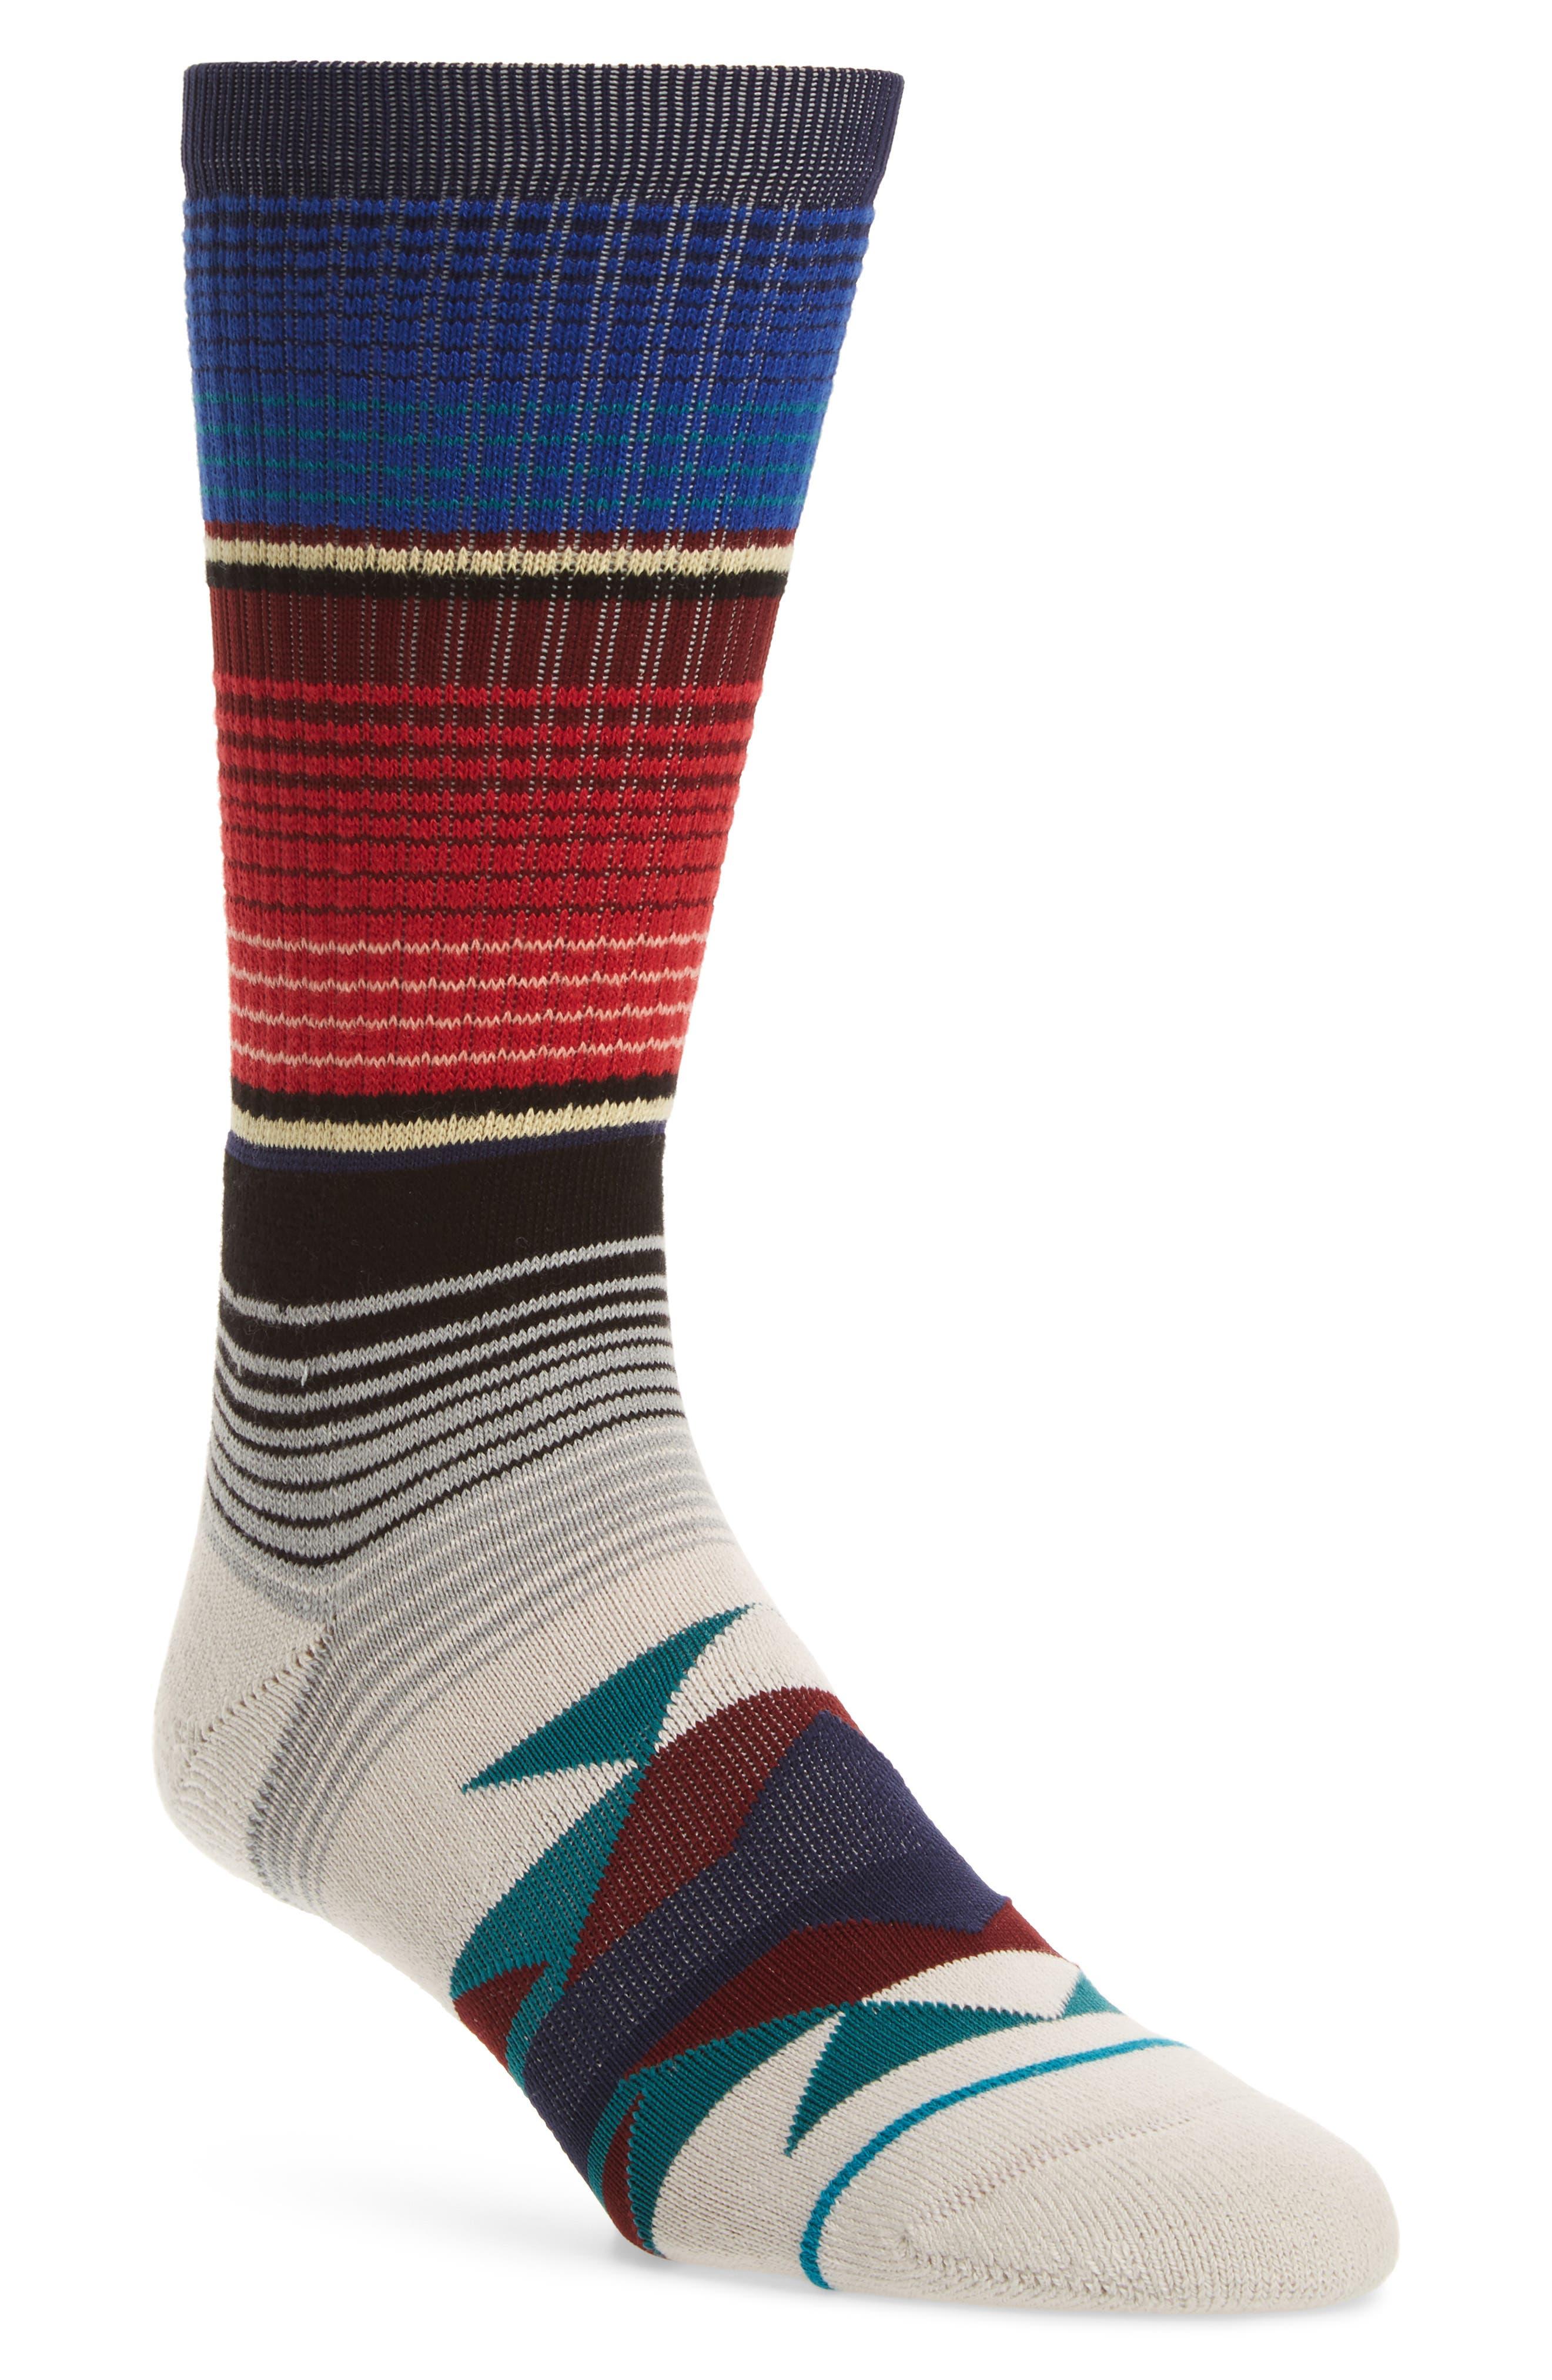 San Blas Crew Socks,                             Main thumbnail 1, color,                             Teal